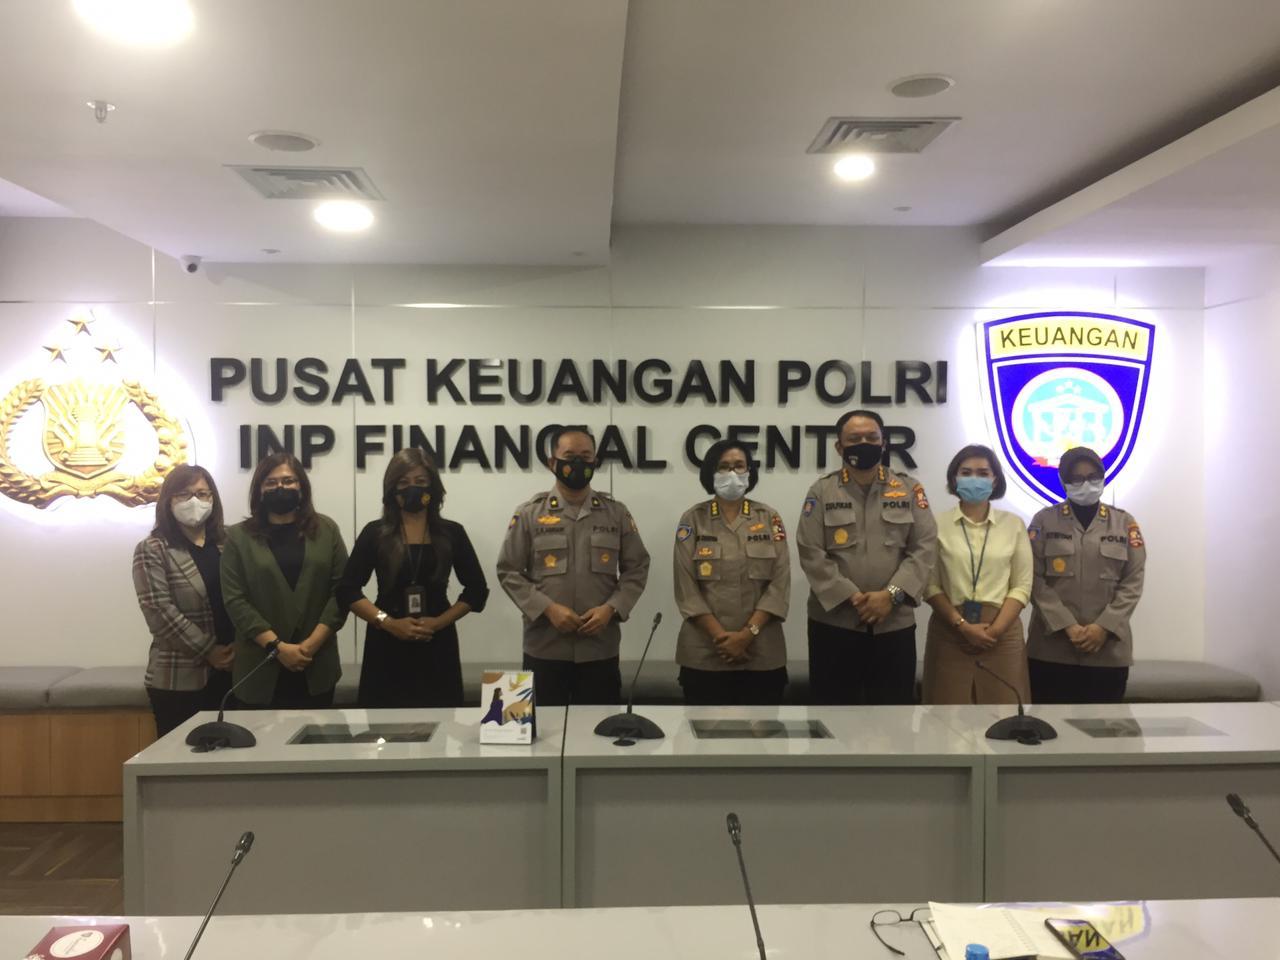 Rapat Koordinasi Puskeu Polri dengan Bank BNI, perihal Pembahasan Restrukturisasi Rekening Benma Polri dari Rekening Giro ke Rekening Virtual Account